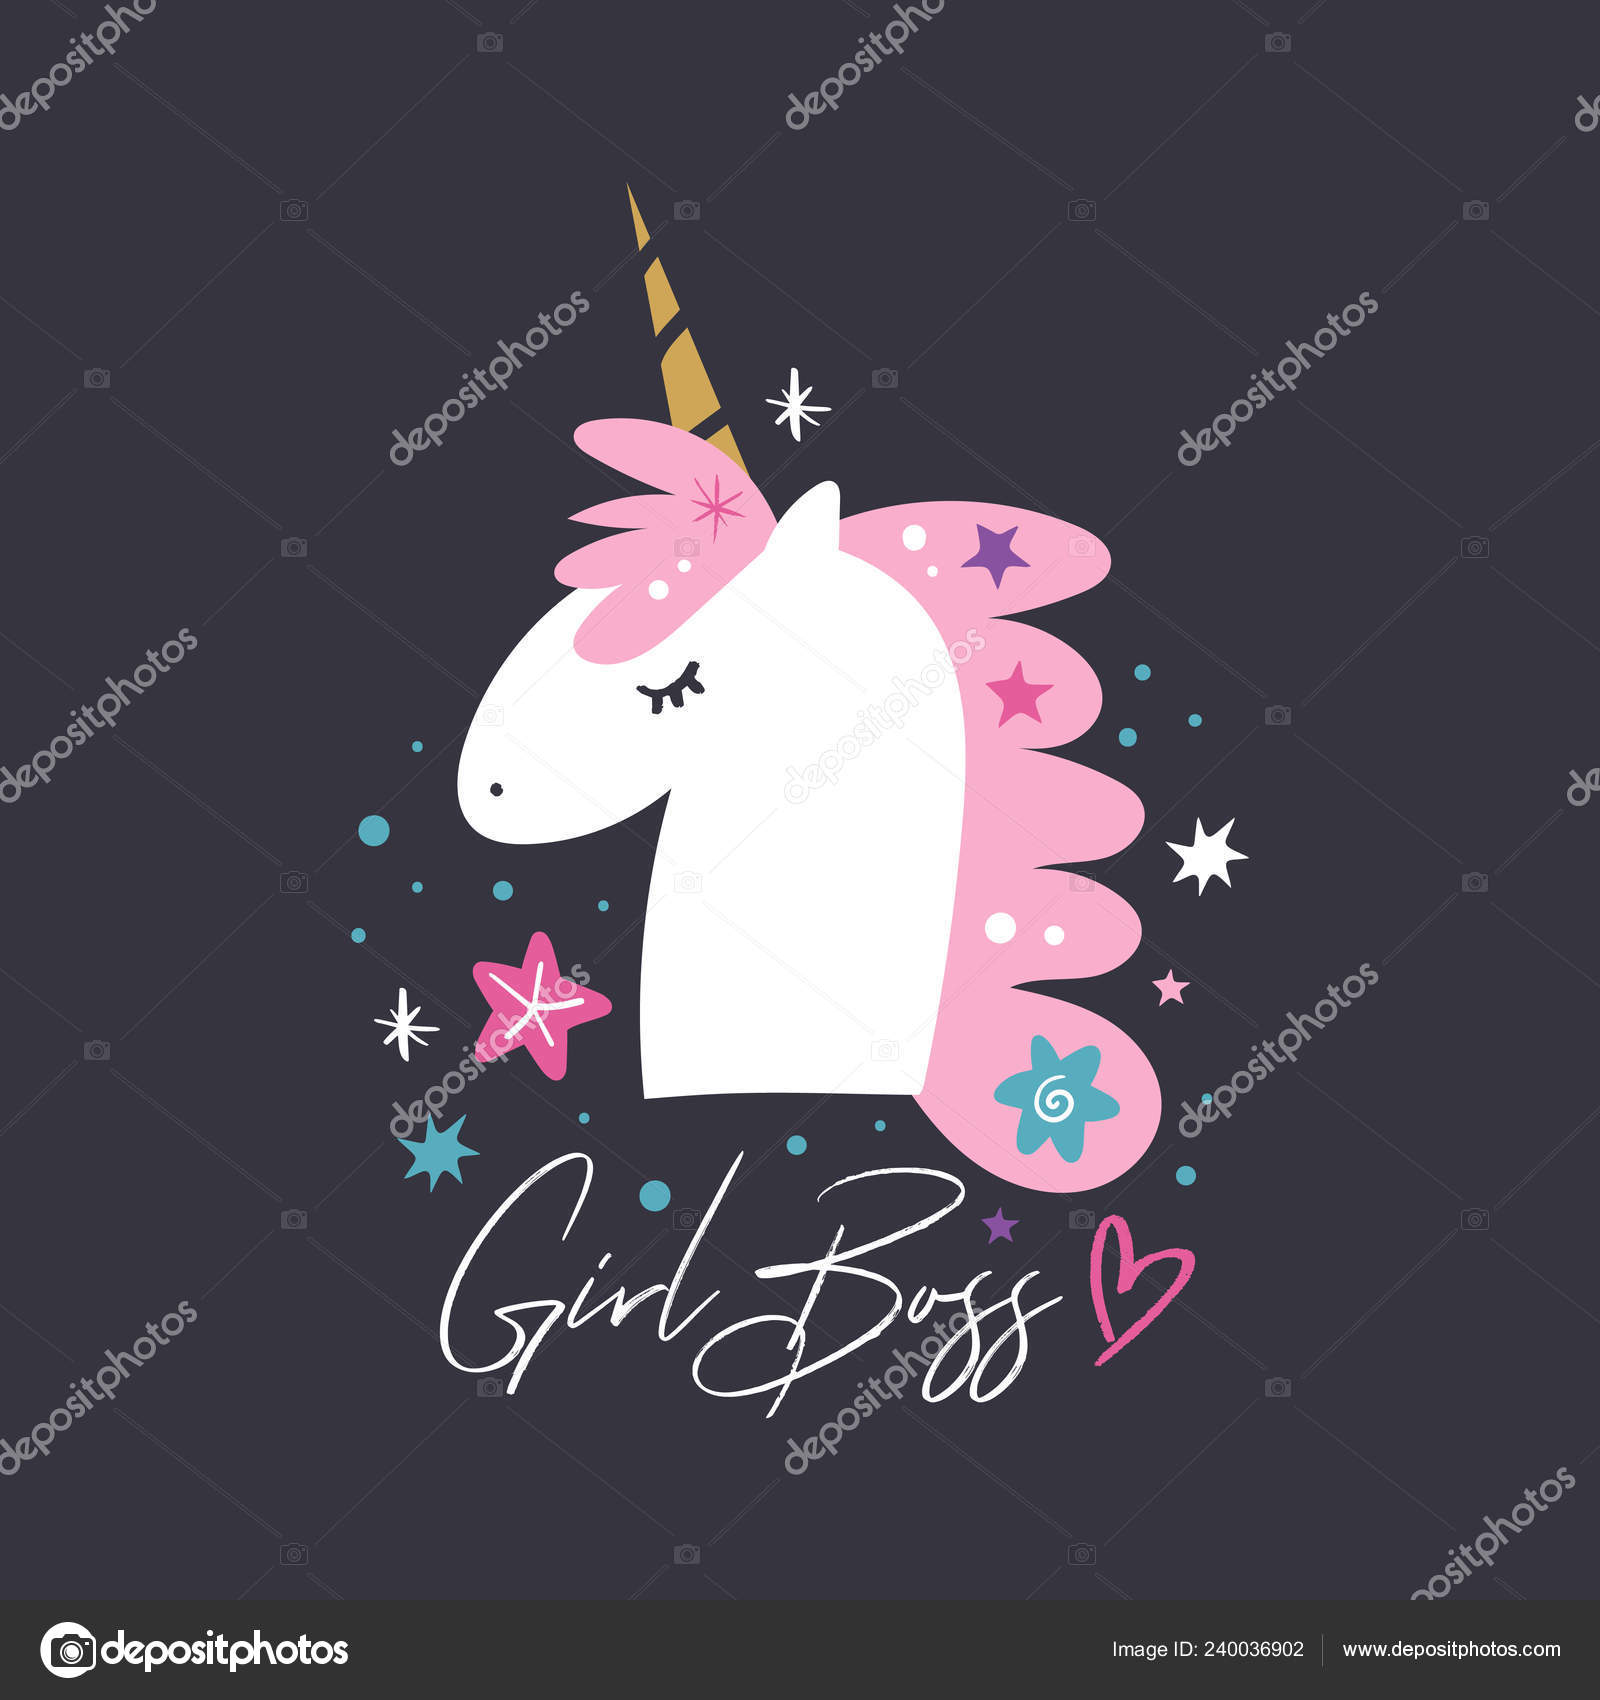 Clipart Black Boss Baby Unicorn Head Cute Art Baby